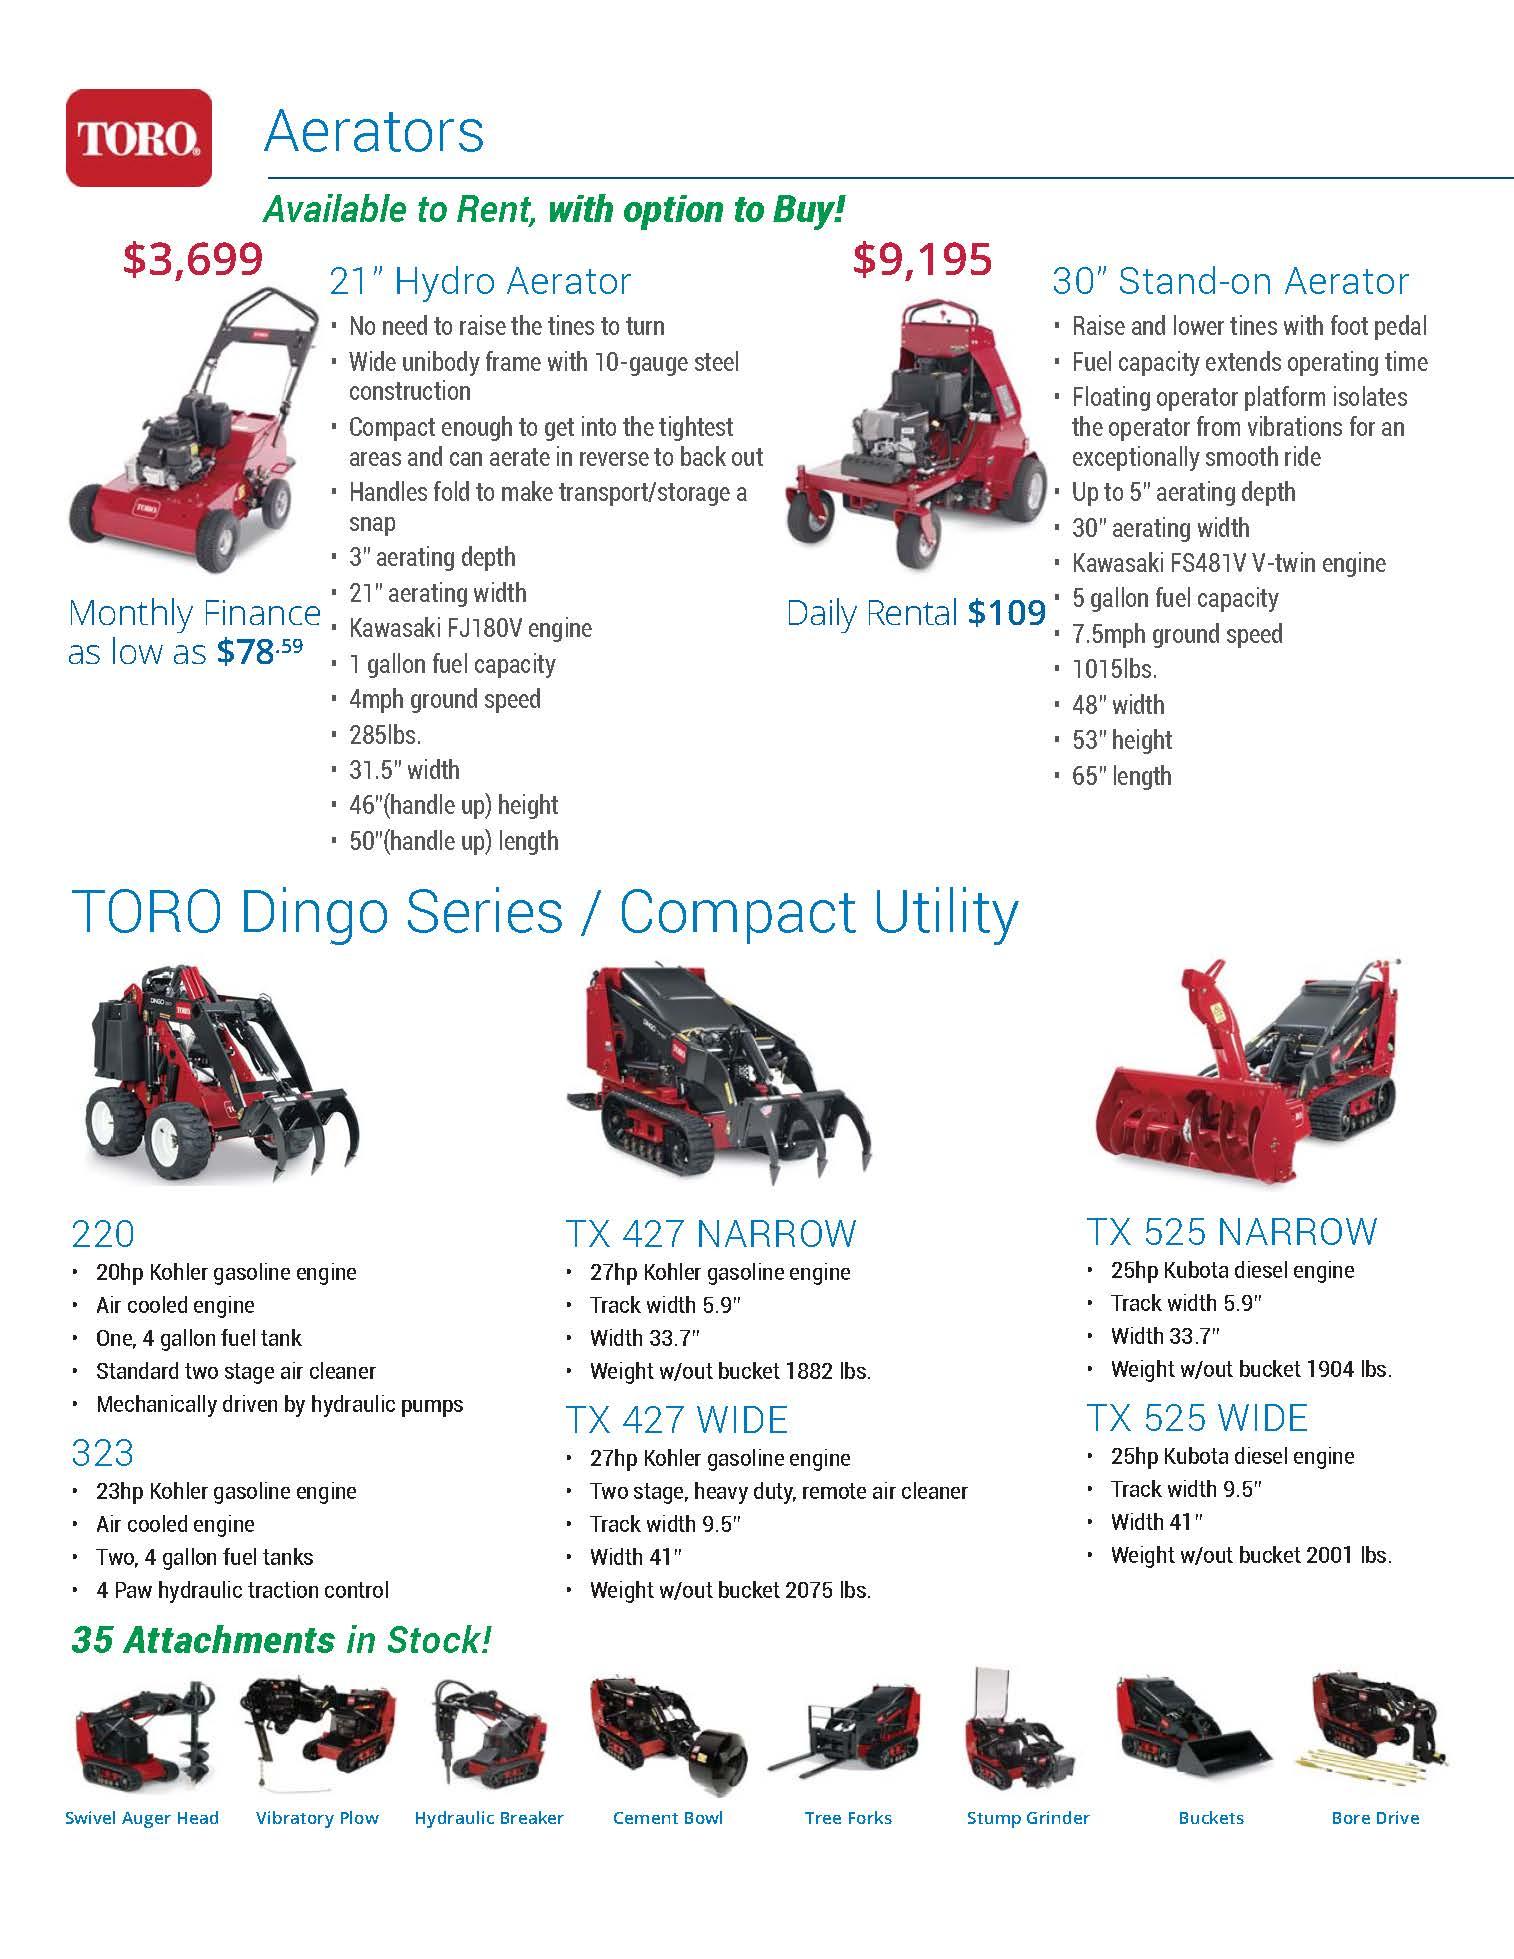 2015 Equipment Brochure 1.3_Page_3.jpg